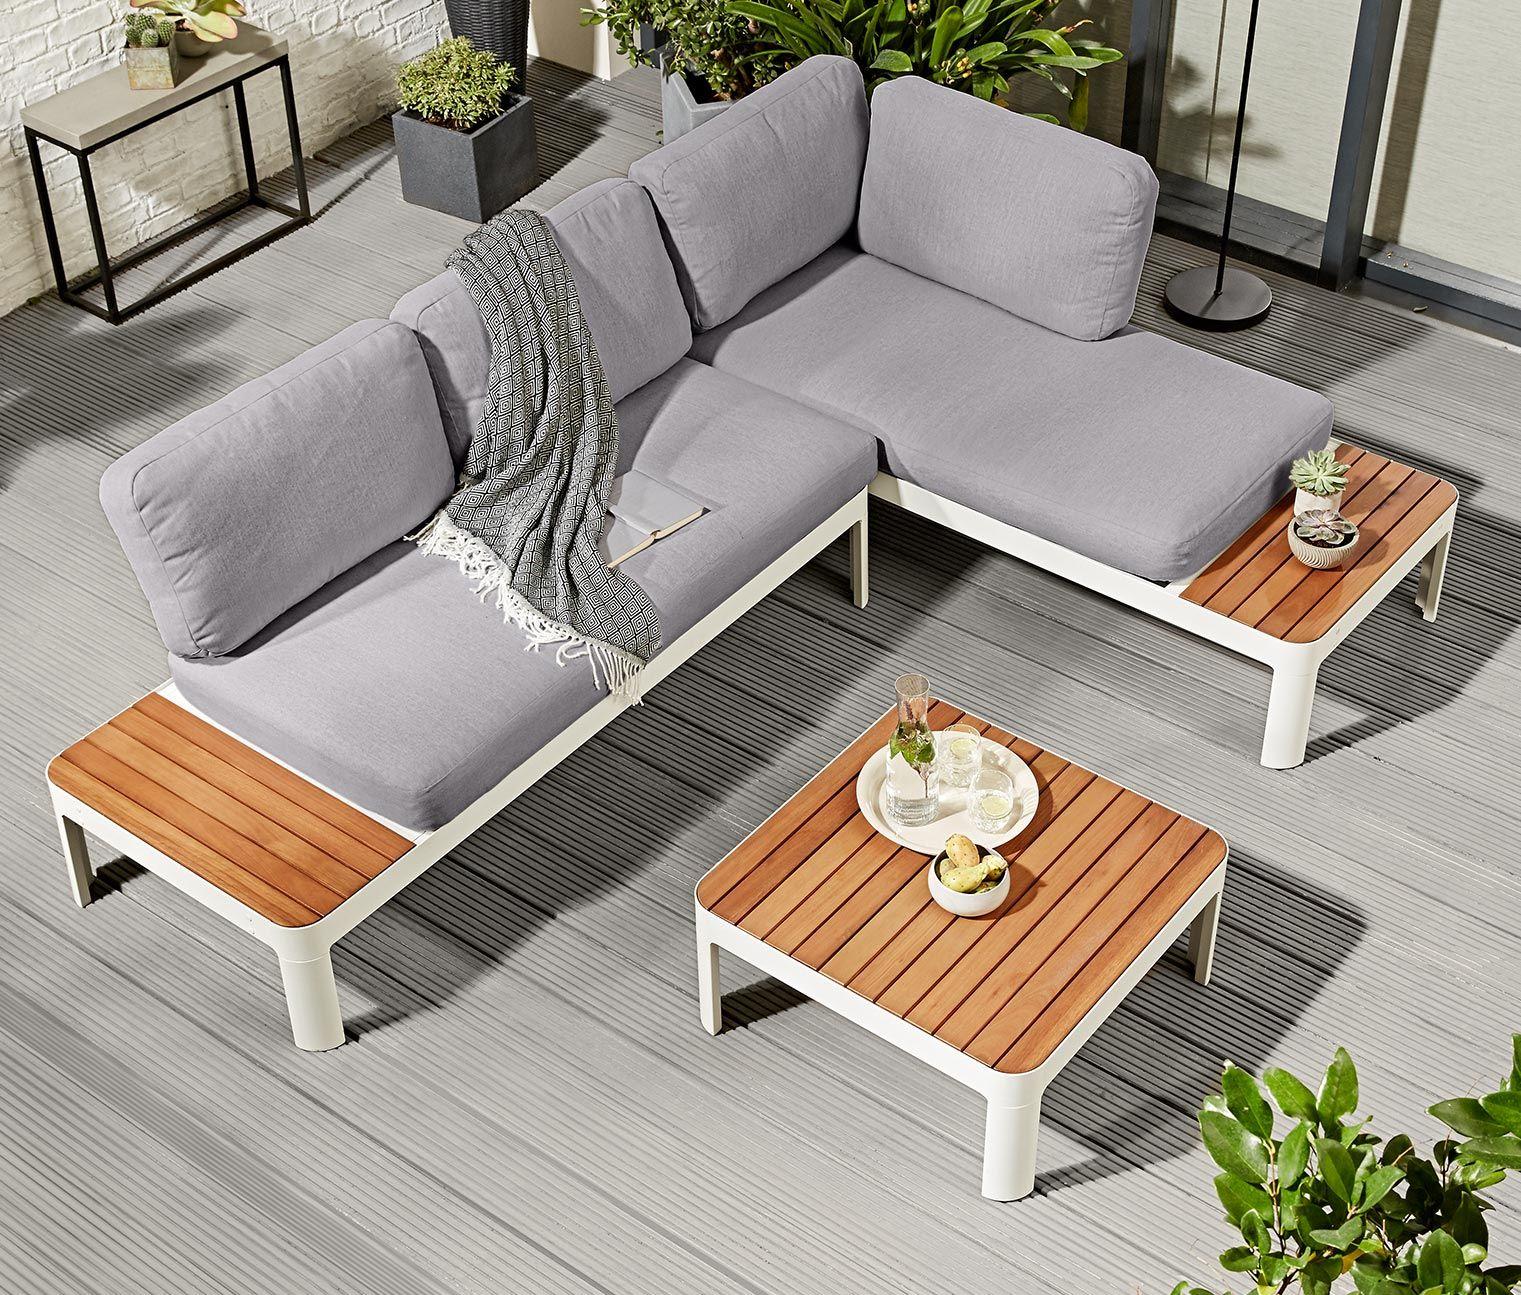 Loungemobel Set Online Bestellen Bei Tchibo 360546 Lounge Mobel Gartenmobel Lounge